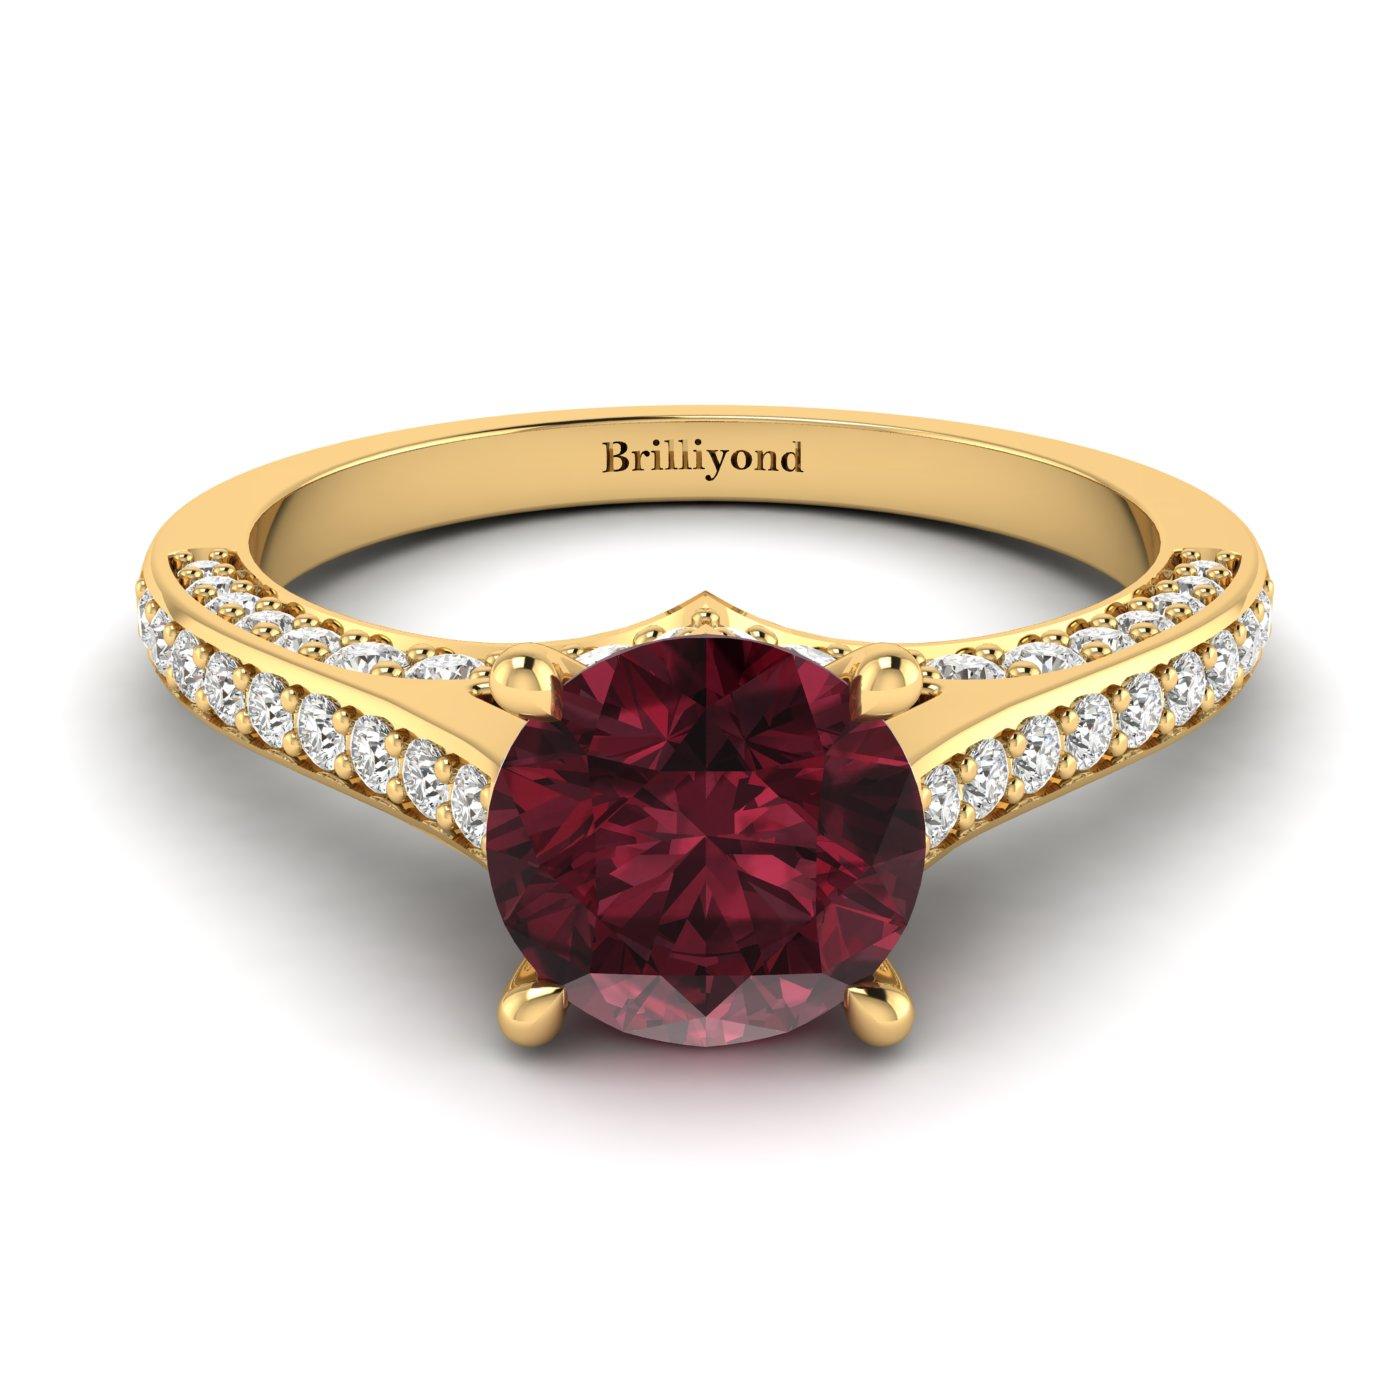 Brilliant Cut Engagement Ring Stargate_image1